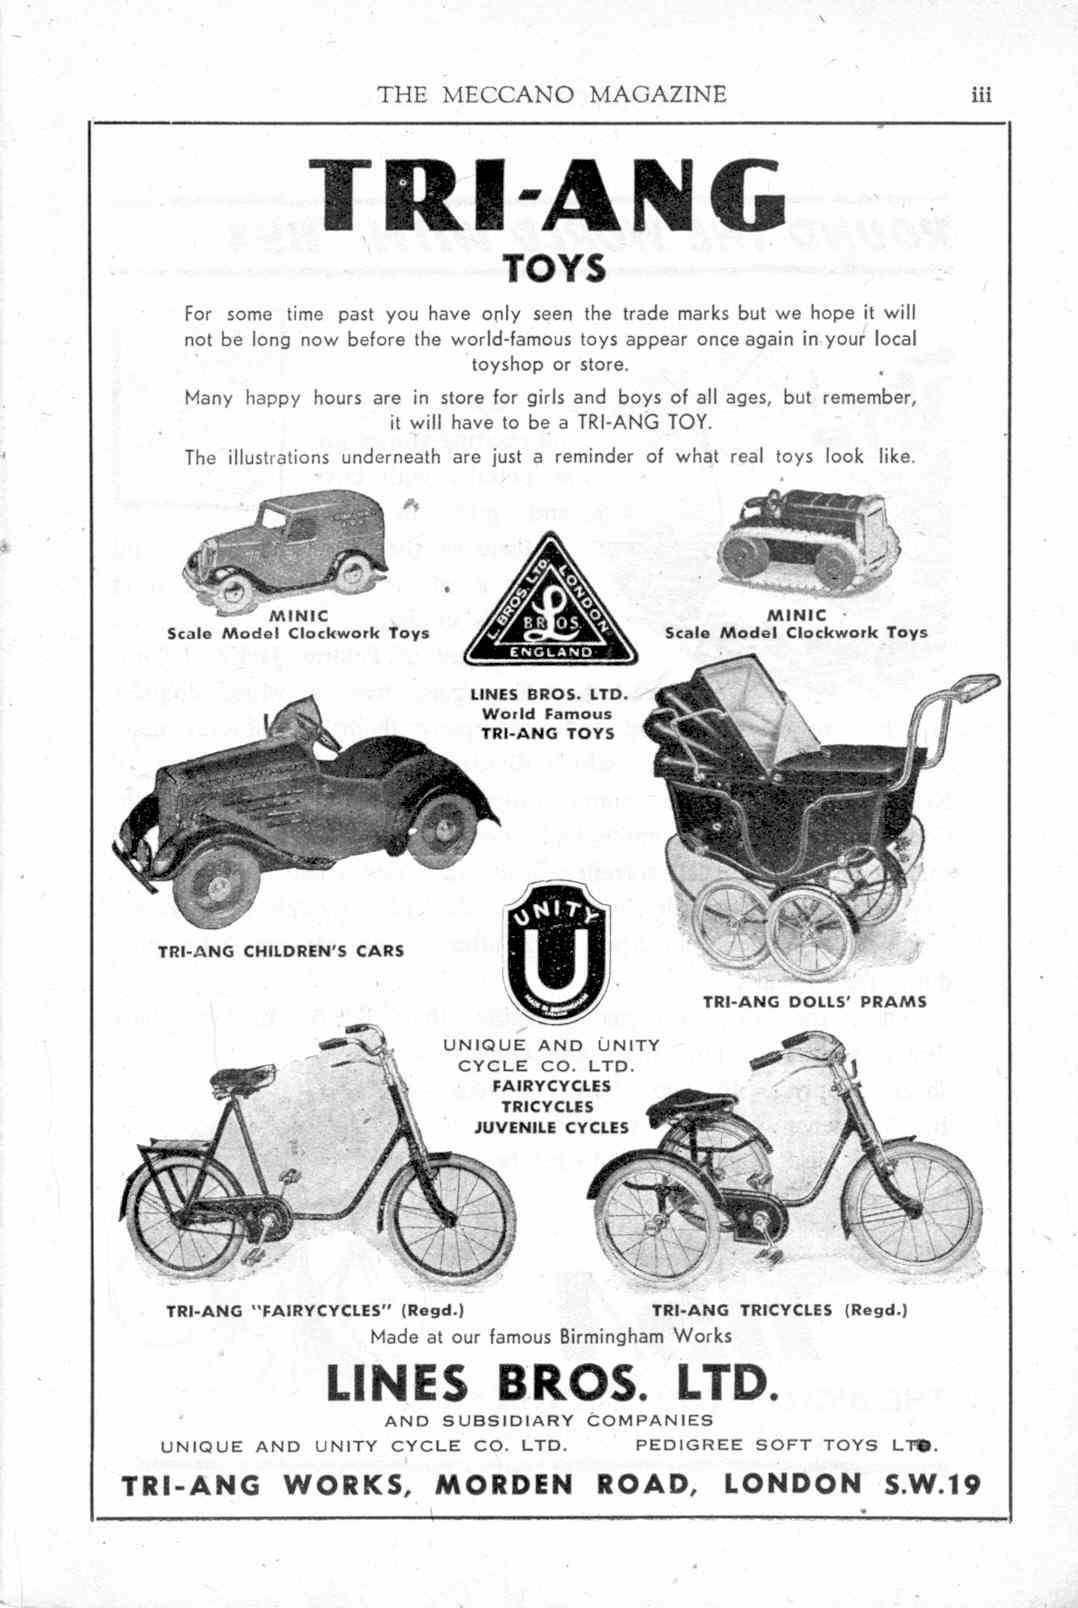 UK Meccano Magazine December 1944 Page iii